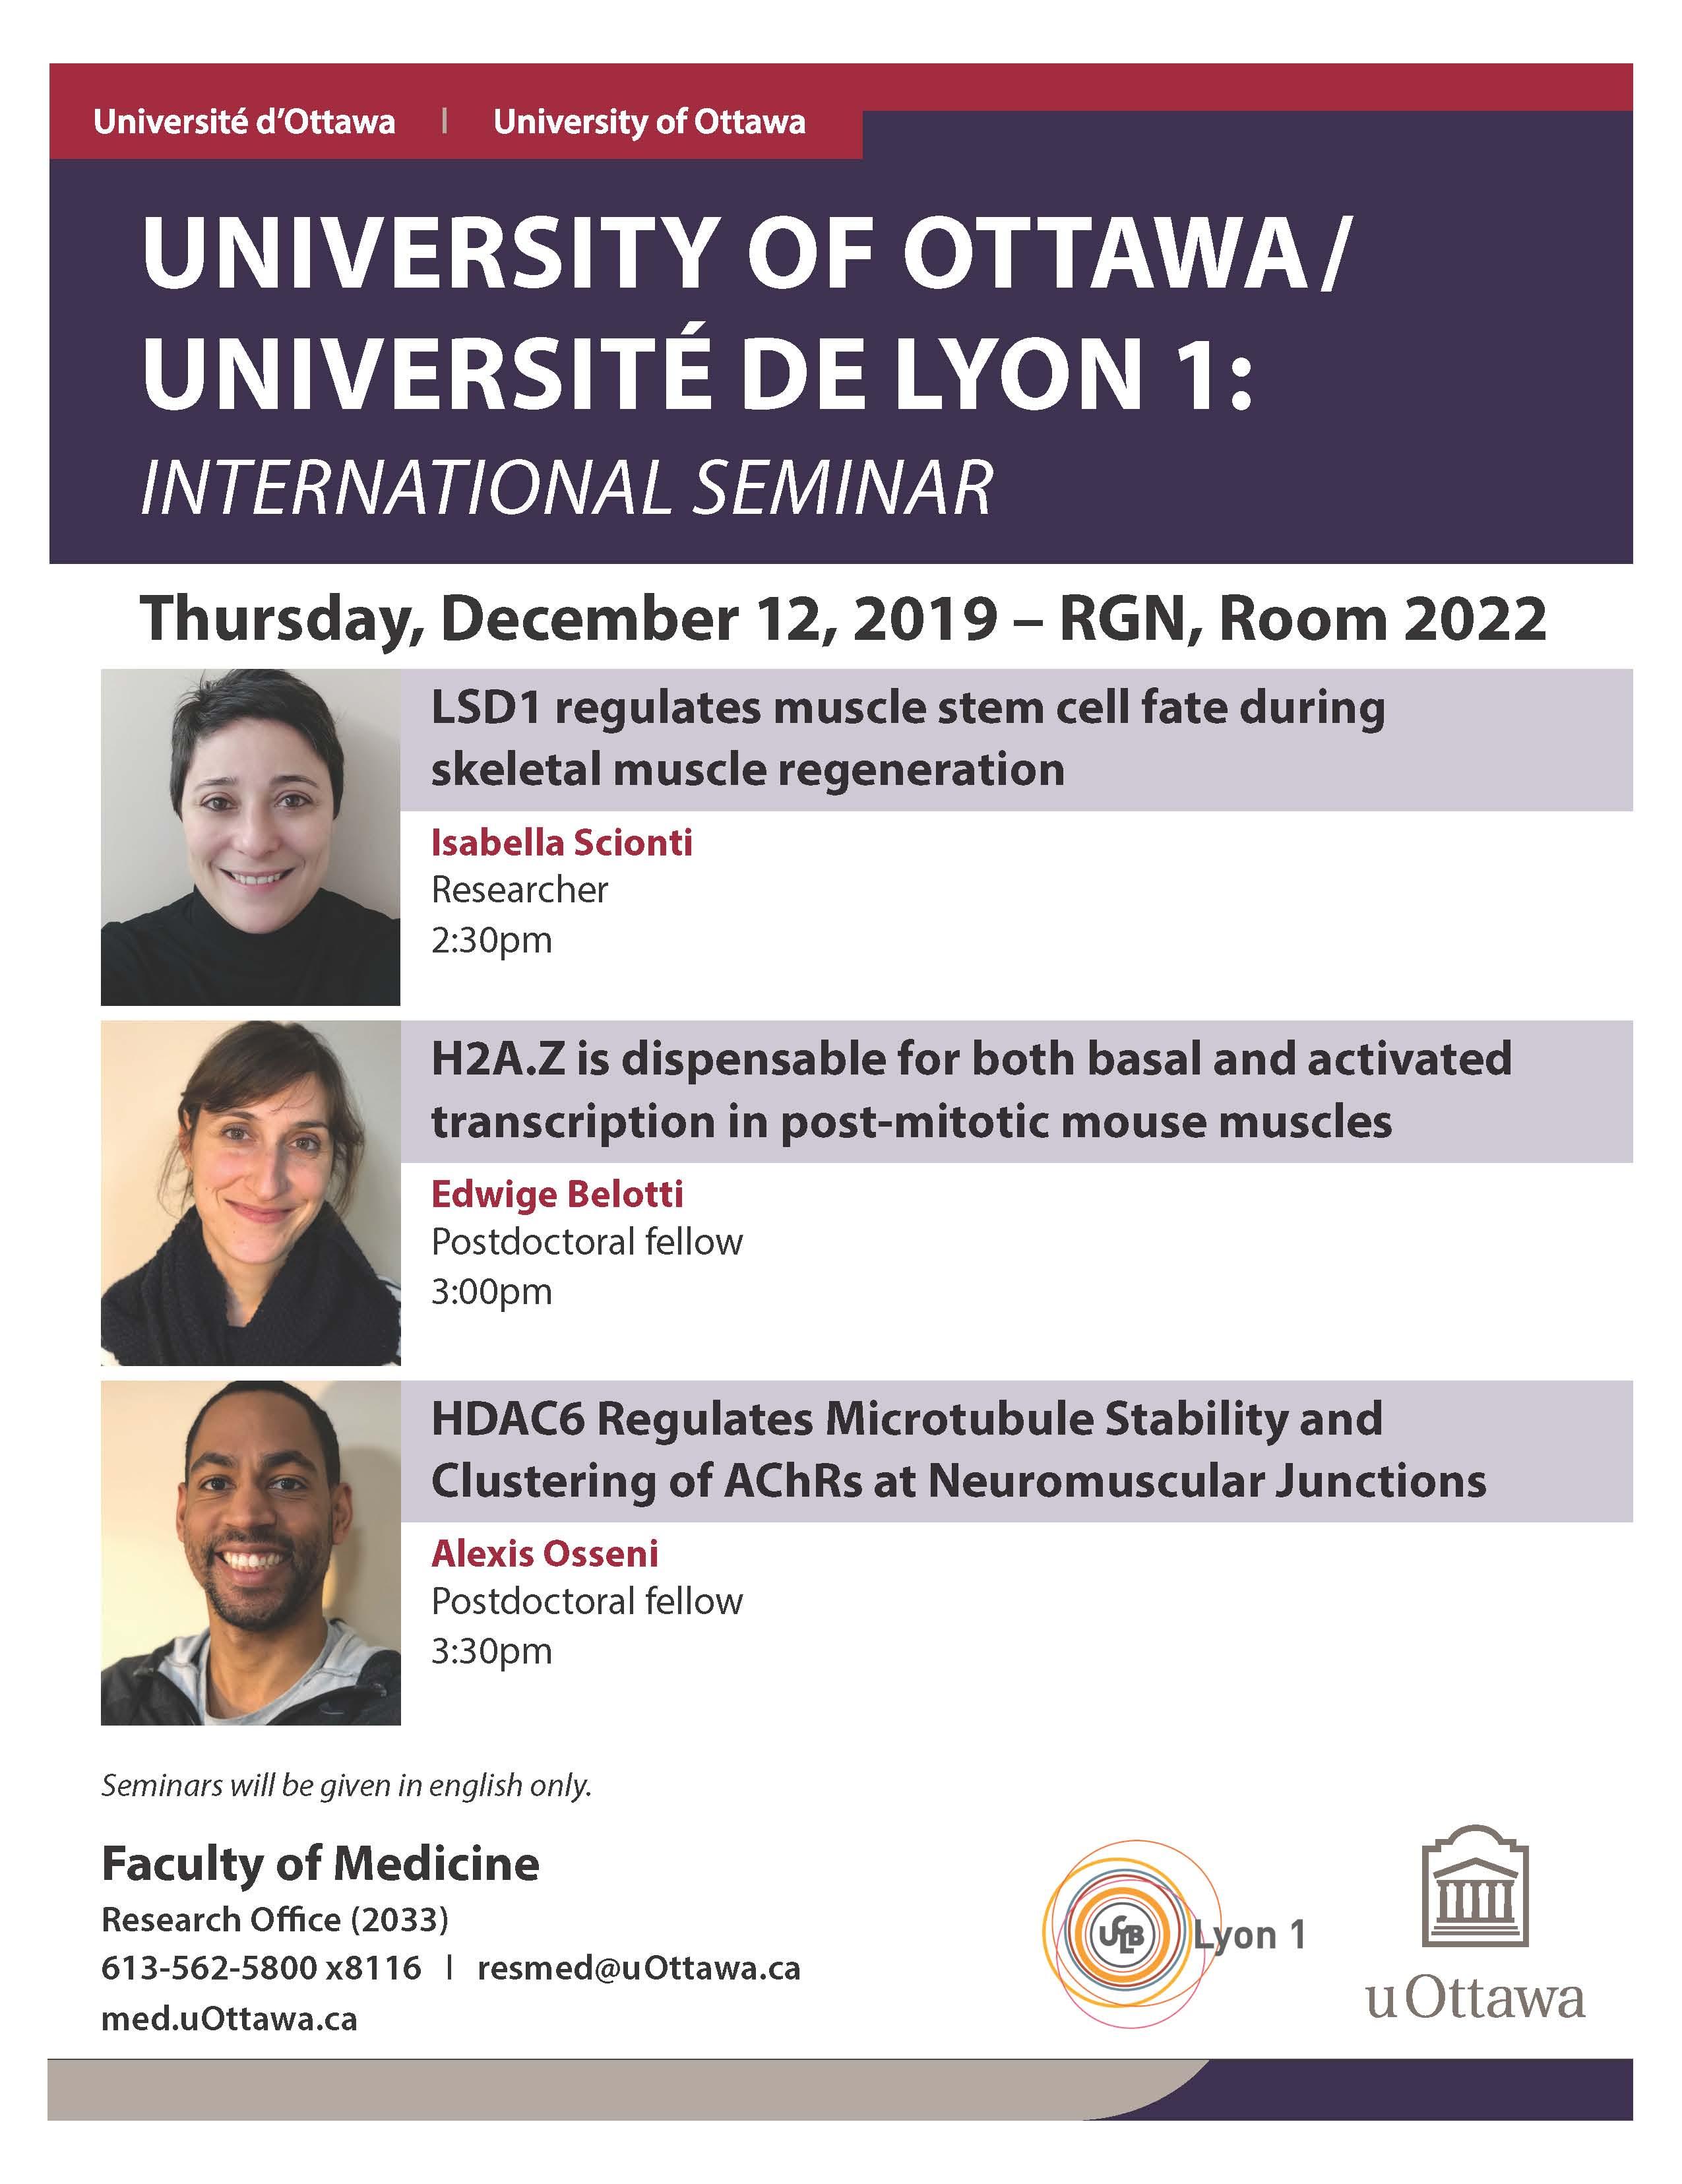 University of Ottawa / Université de Lyon 1 International Seminar